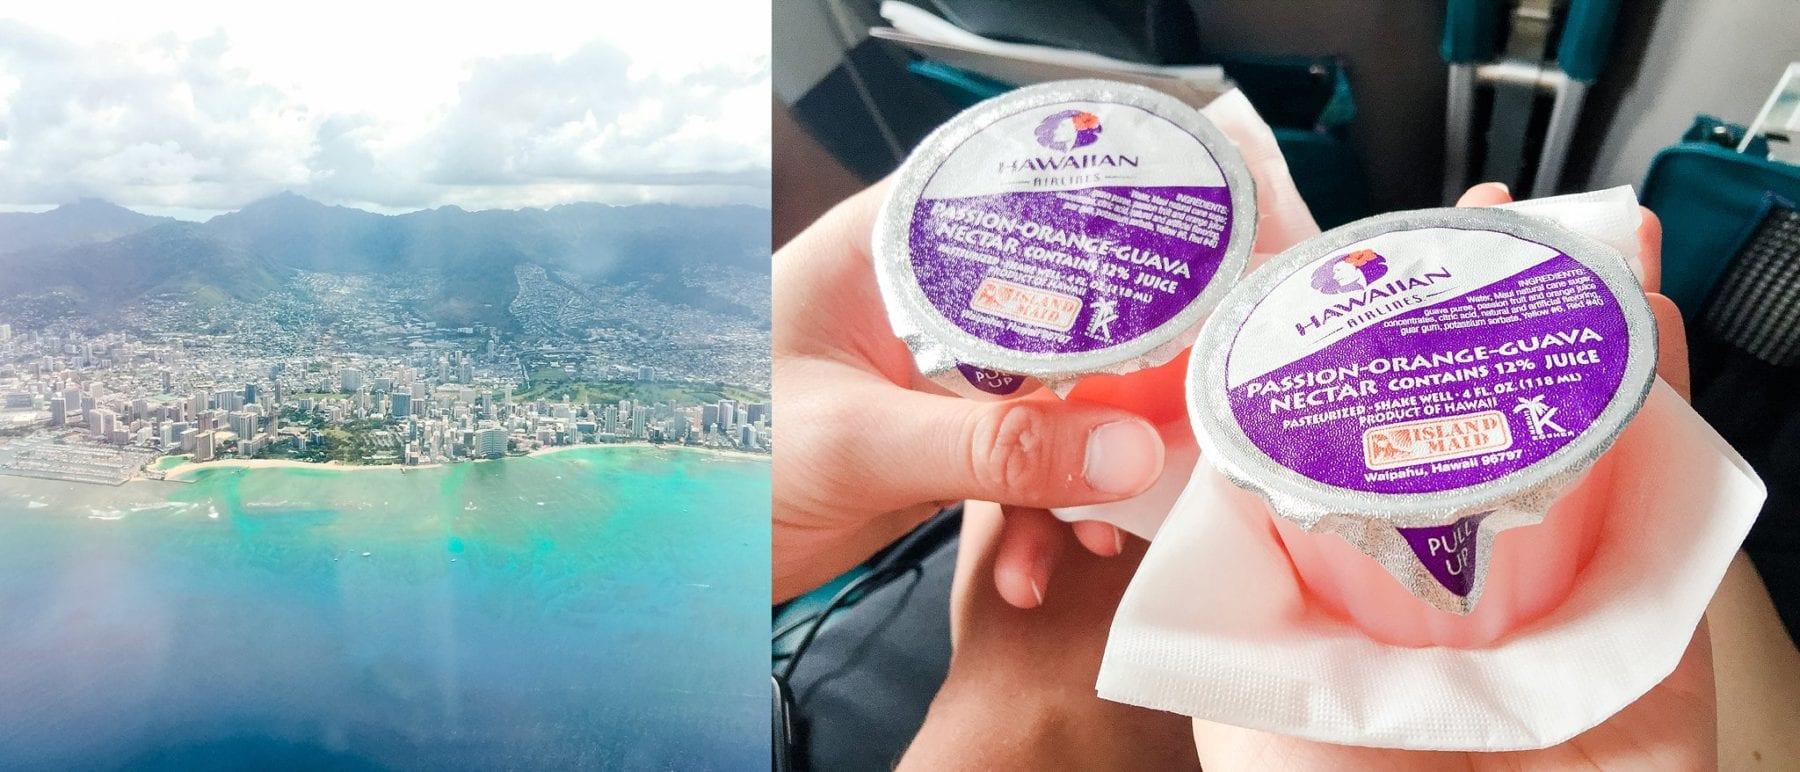 Hawaii Honeymoon Photos Megan & Justin Maui Vacation Things To Do iPhone-1.jpg